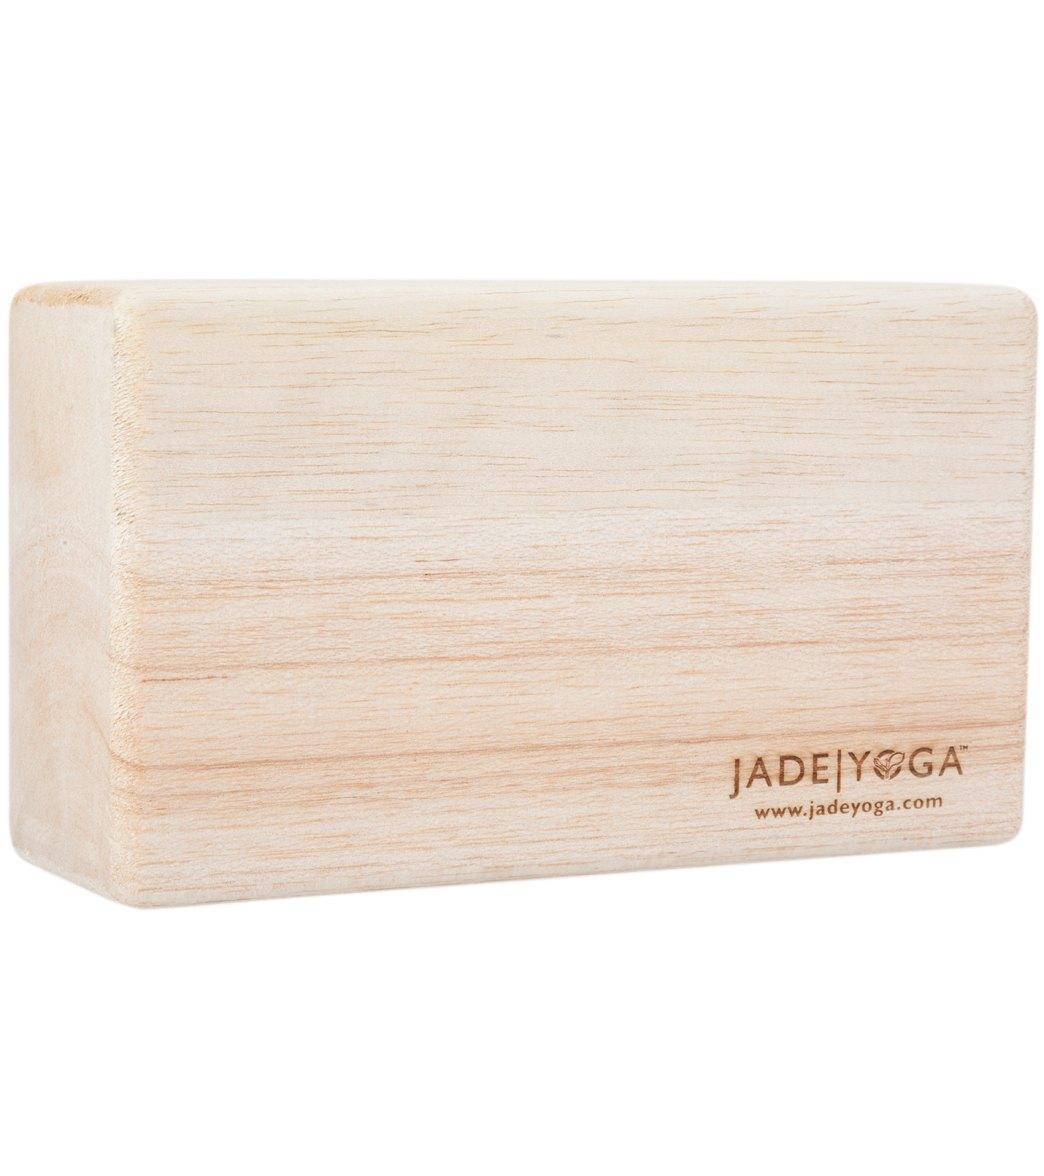 Jade Yoga Balsa Superlight Block Large 22oz At Swimoutlet Com